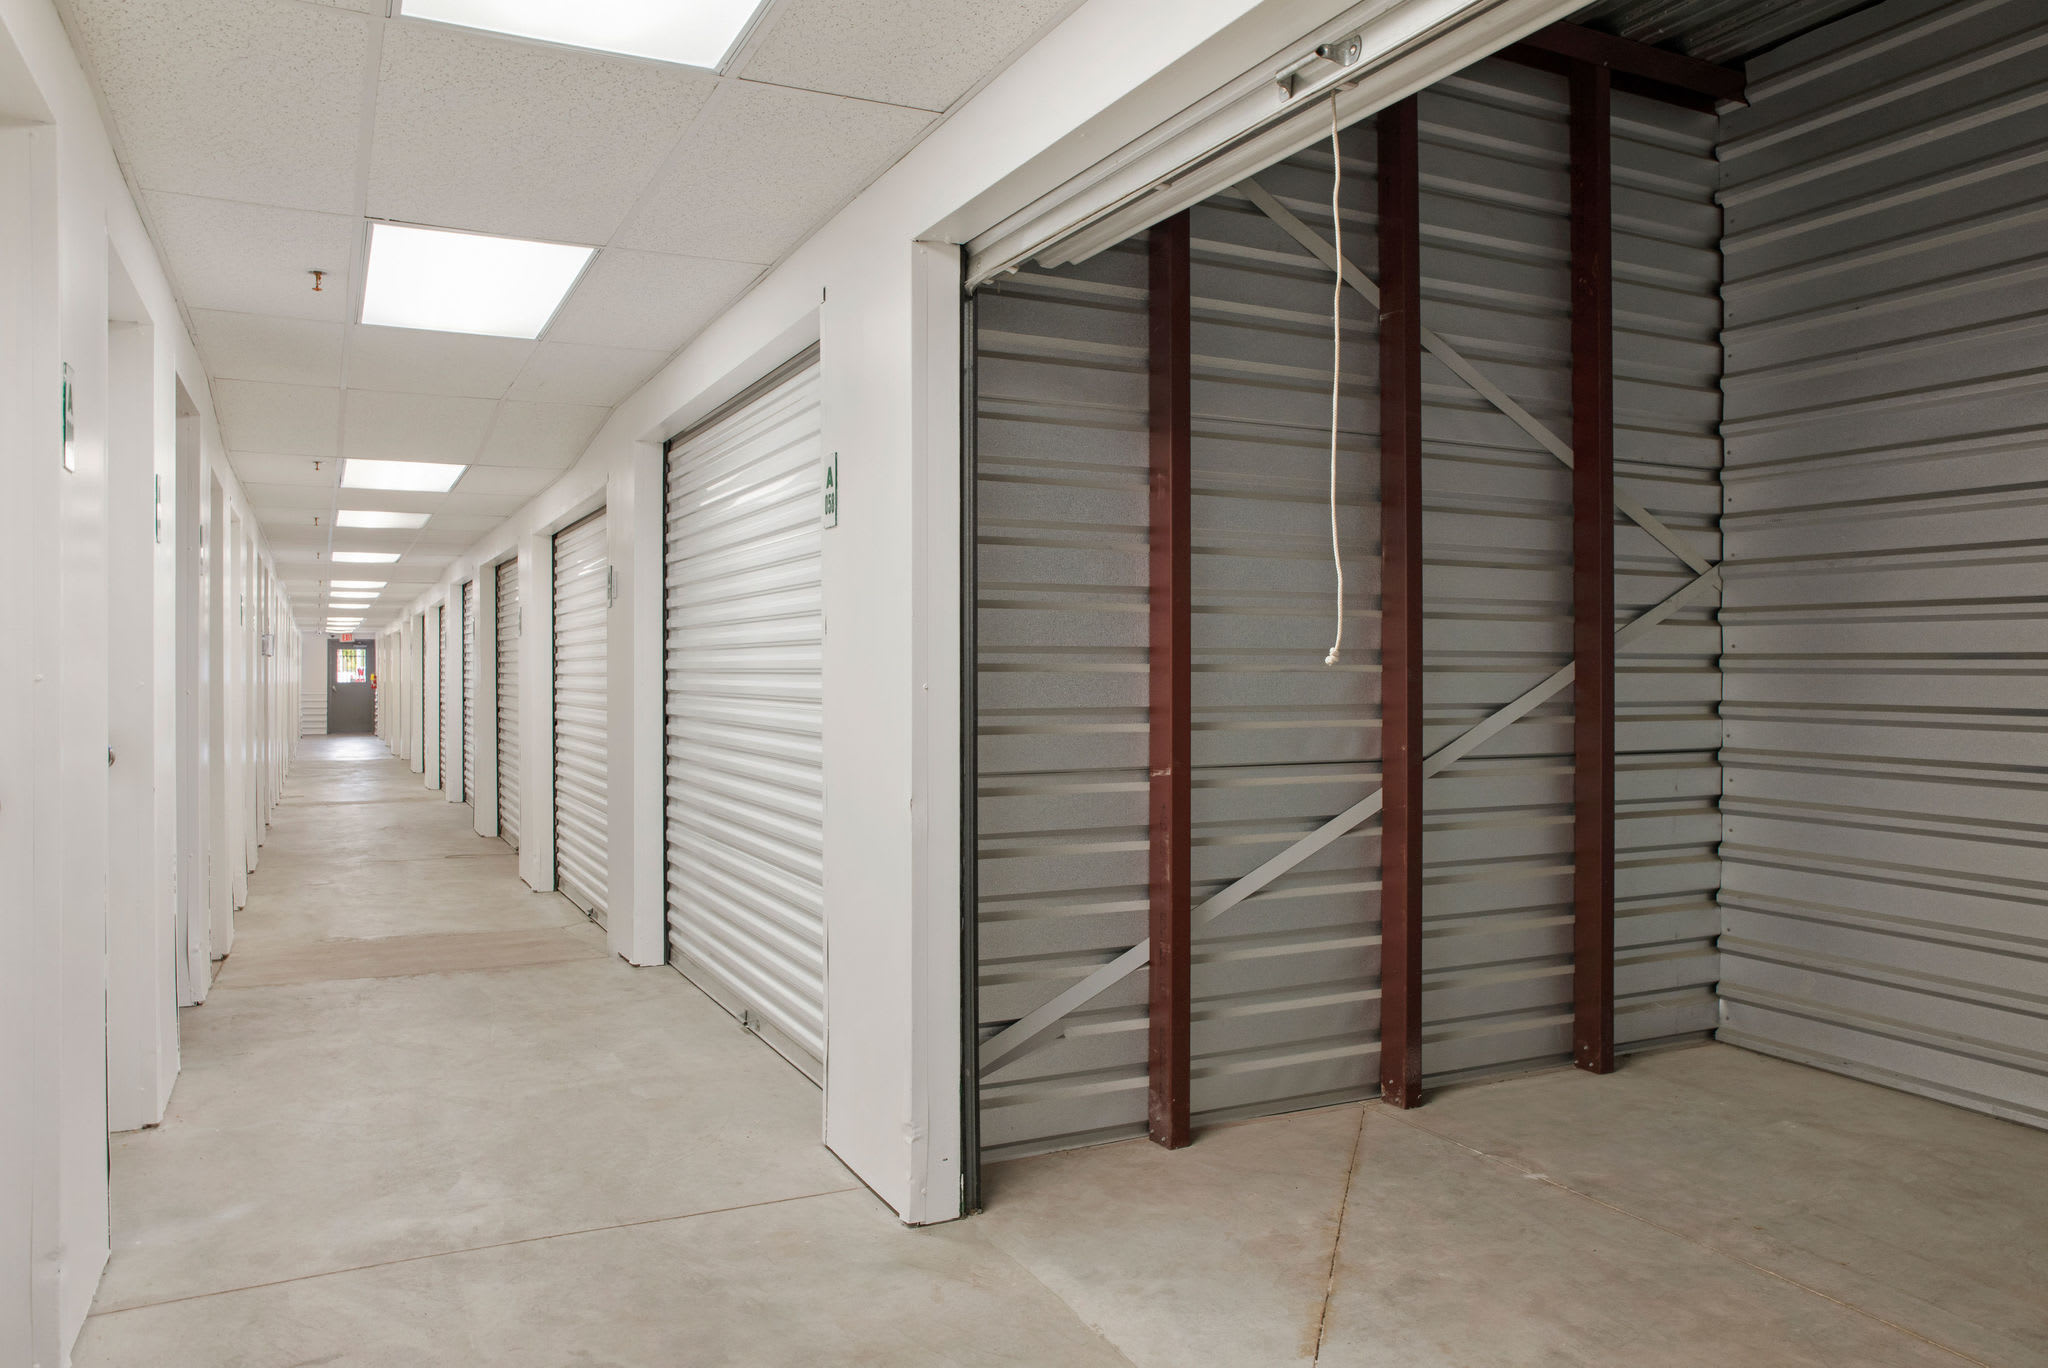 Interior storage units at Stor'em Self Storage in Sandy, Utah